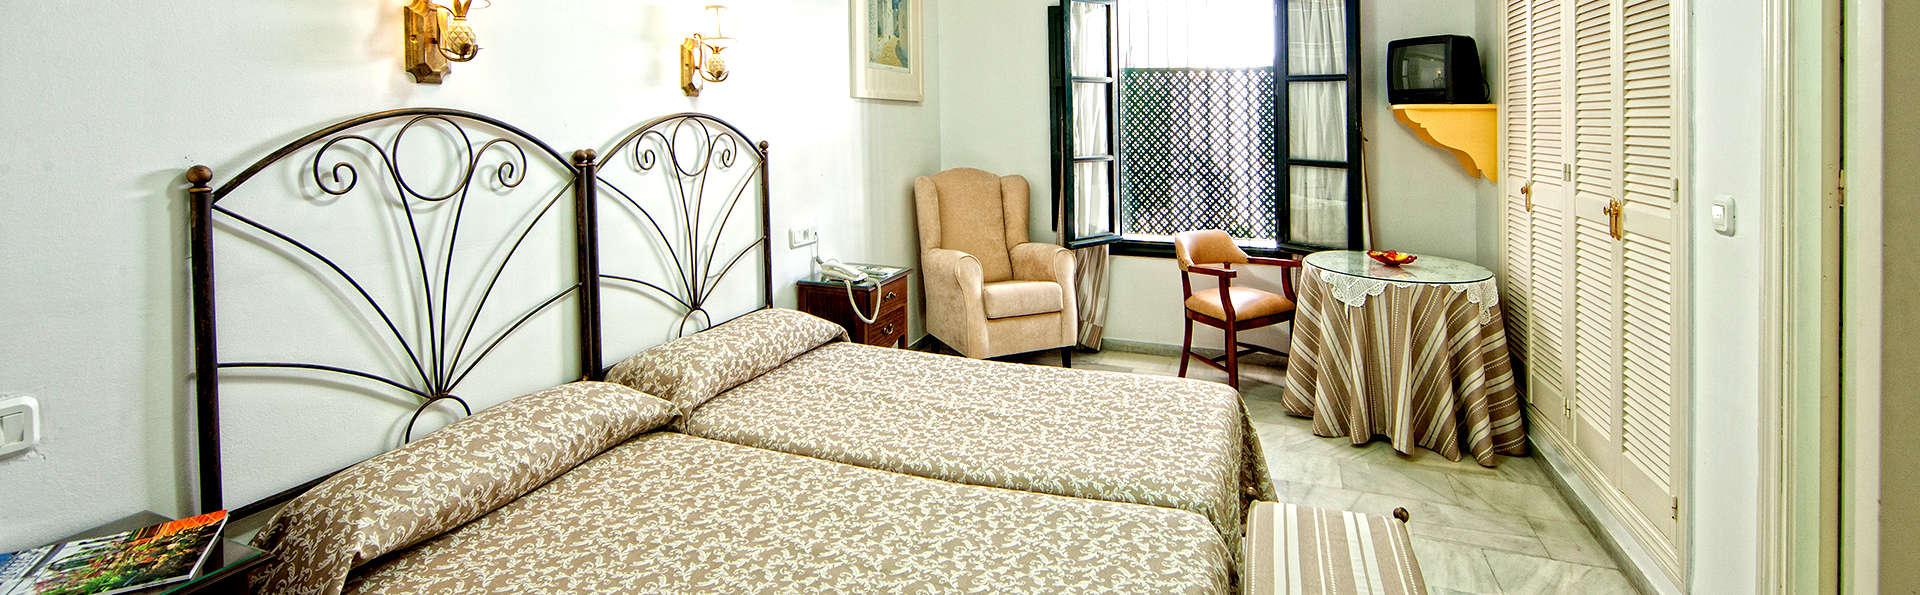 Hotel Los Helechos - Edit_Room3.jpg